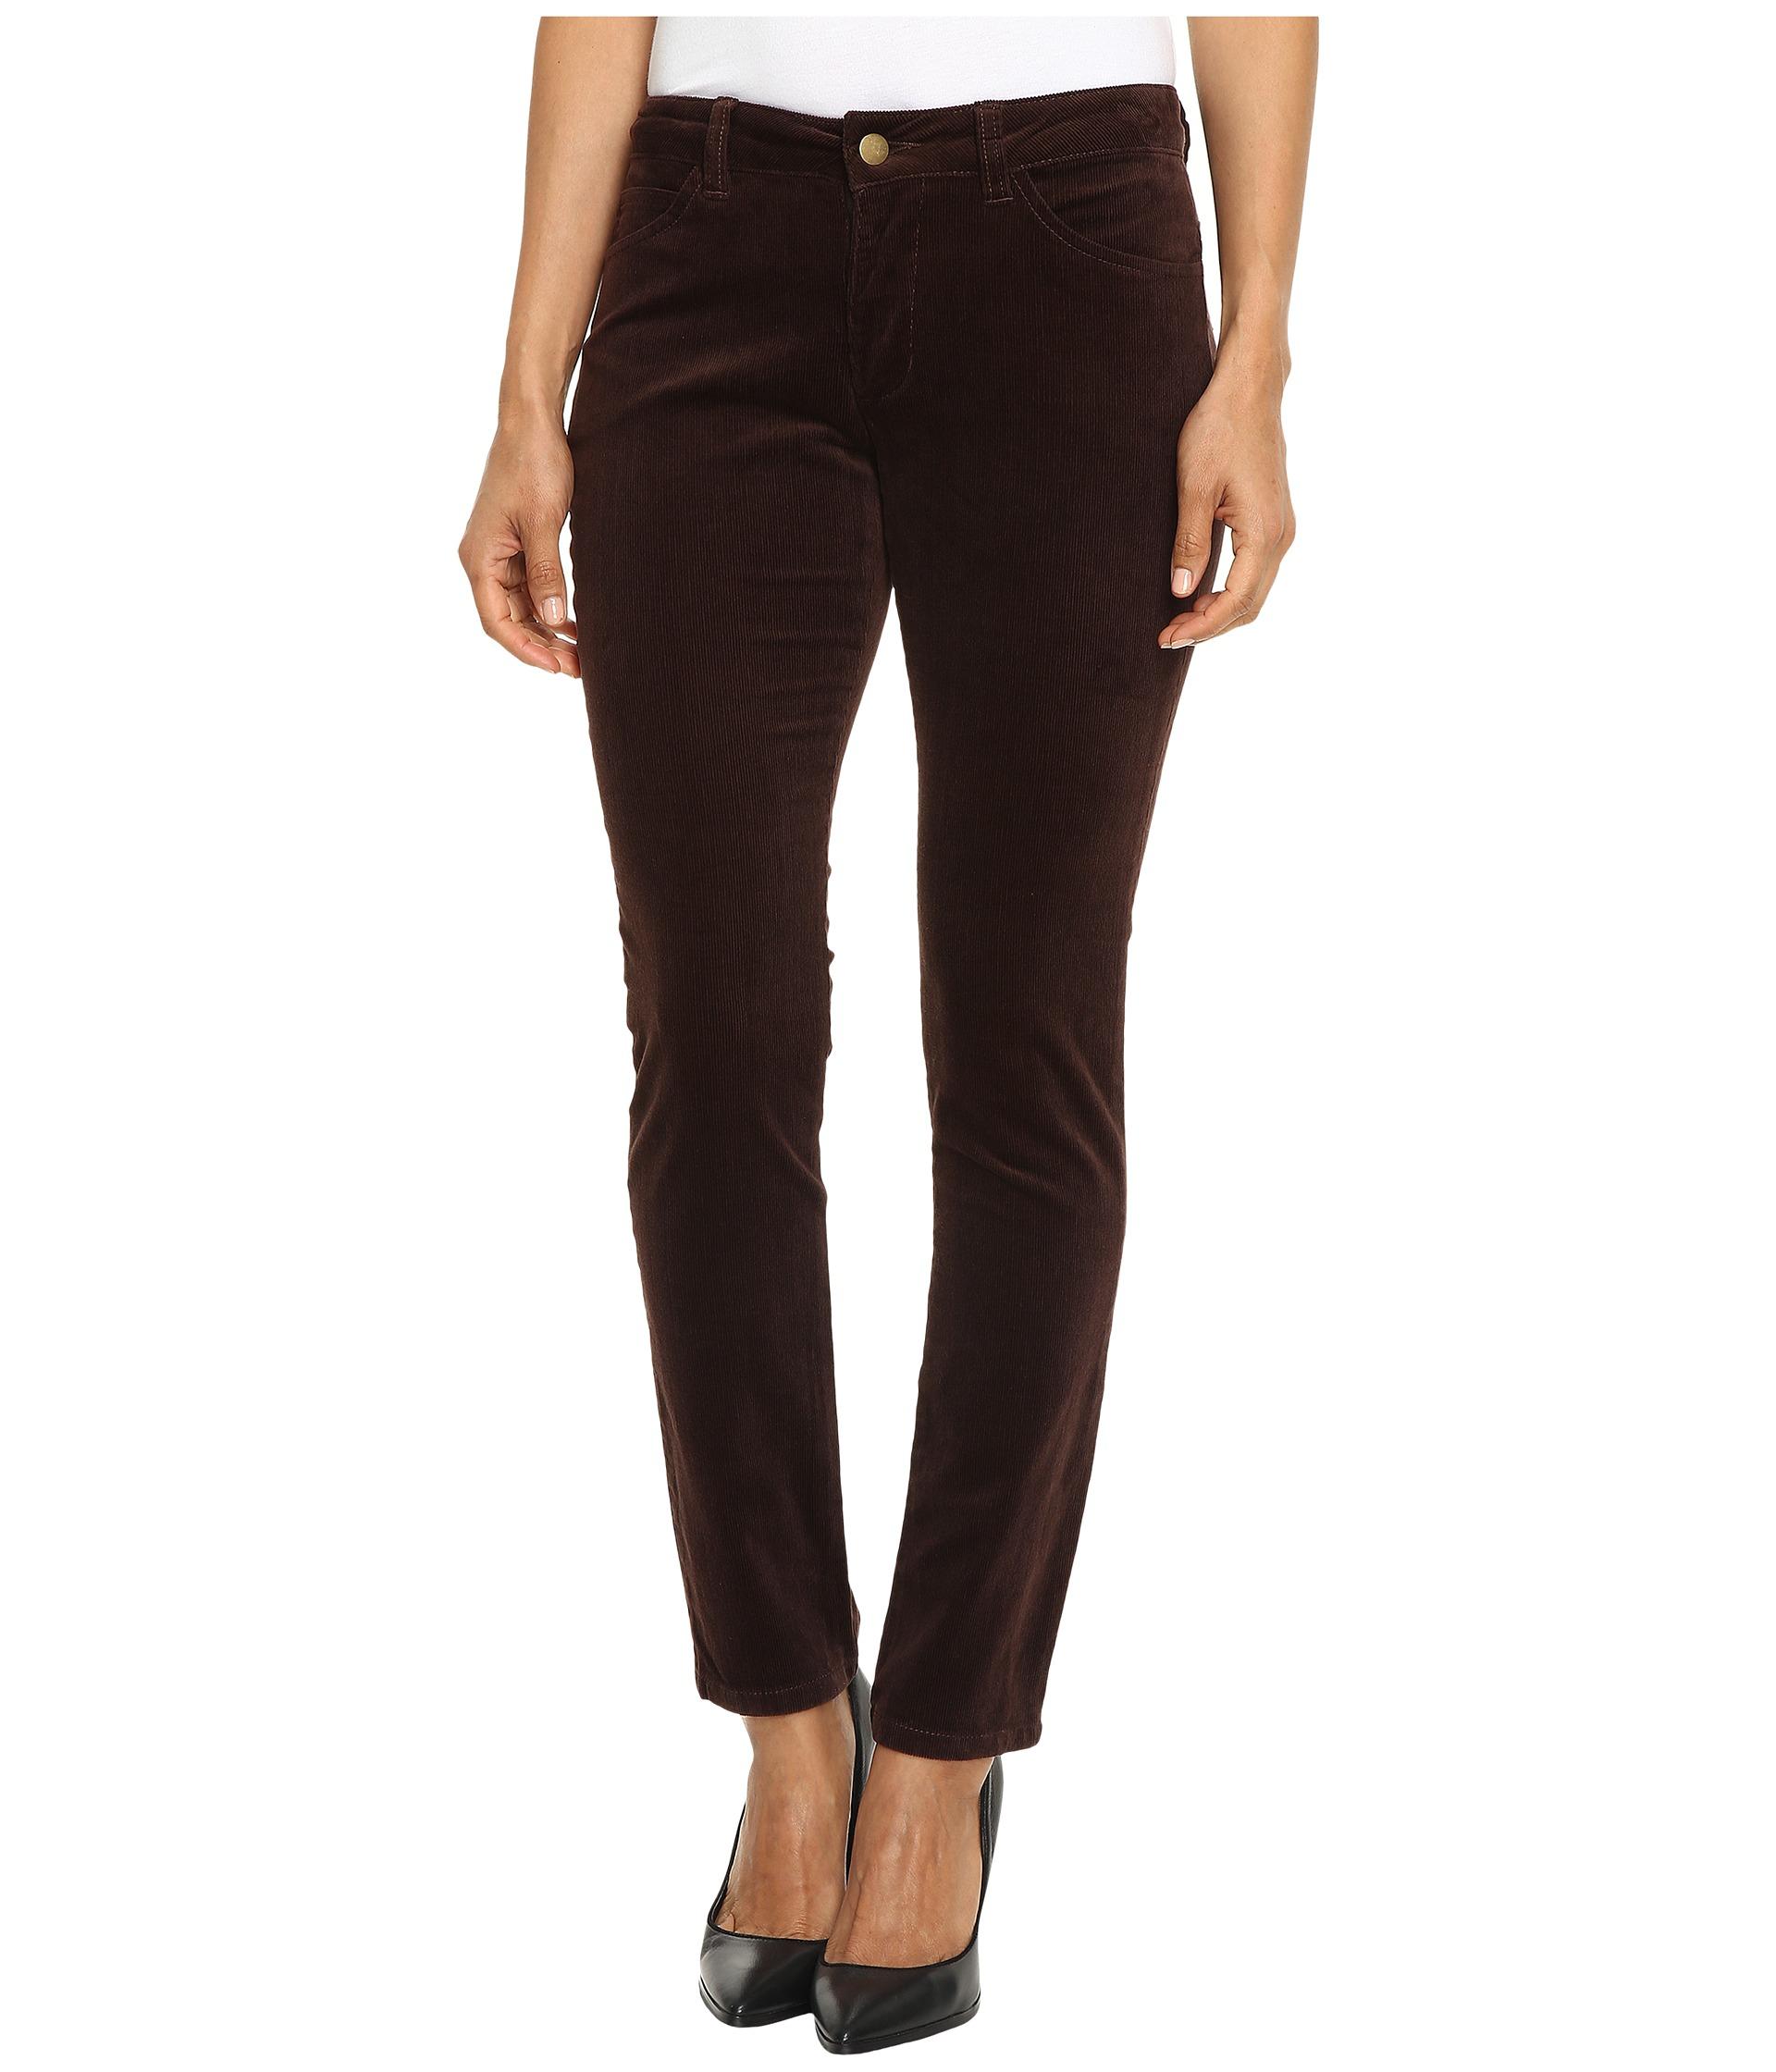 Free shipping and returns on Women's Corduroy Pants & Leggings at distrib-wjmx2fn9.ga